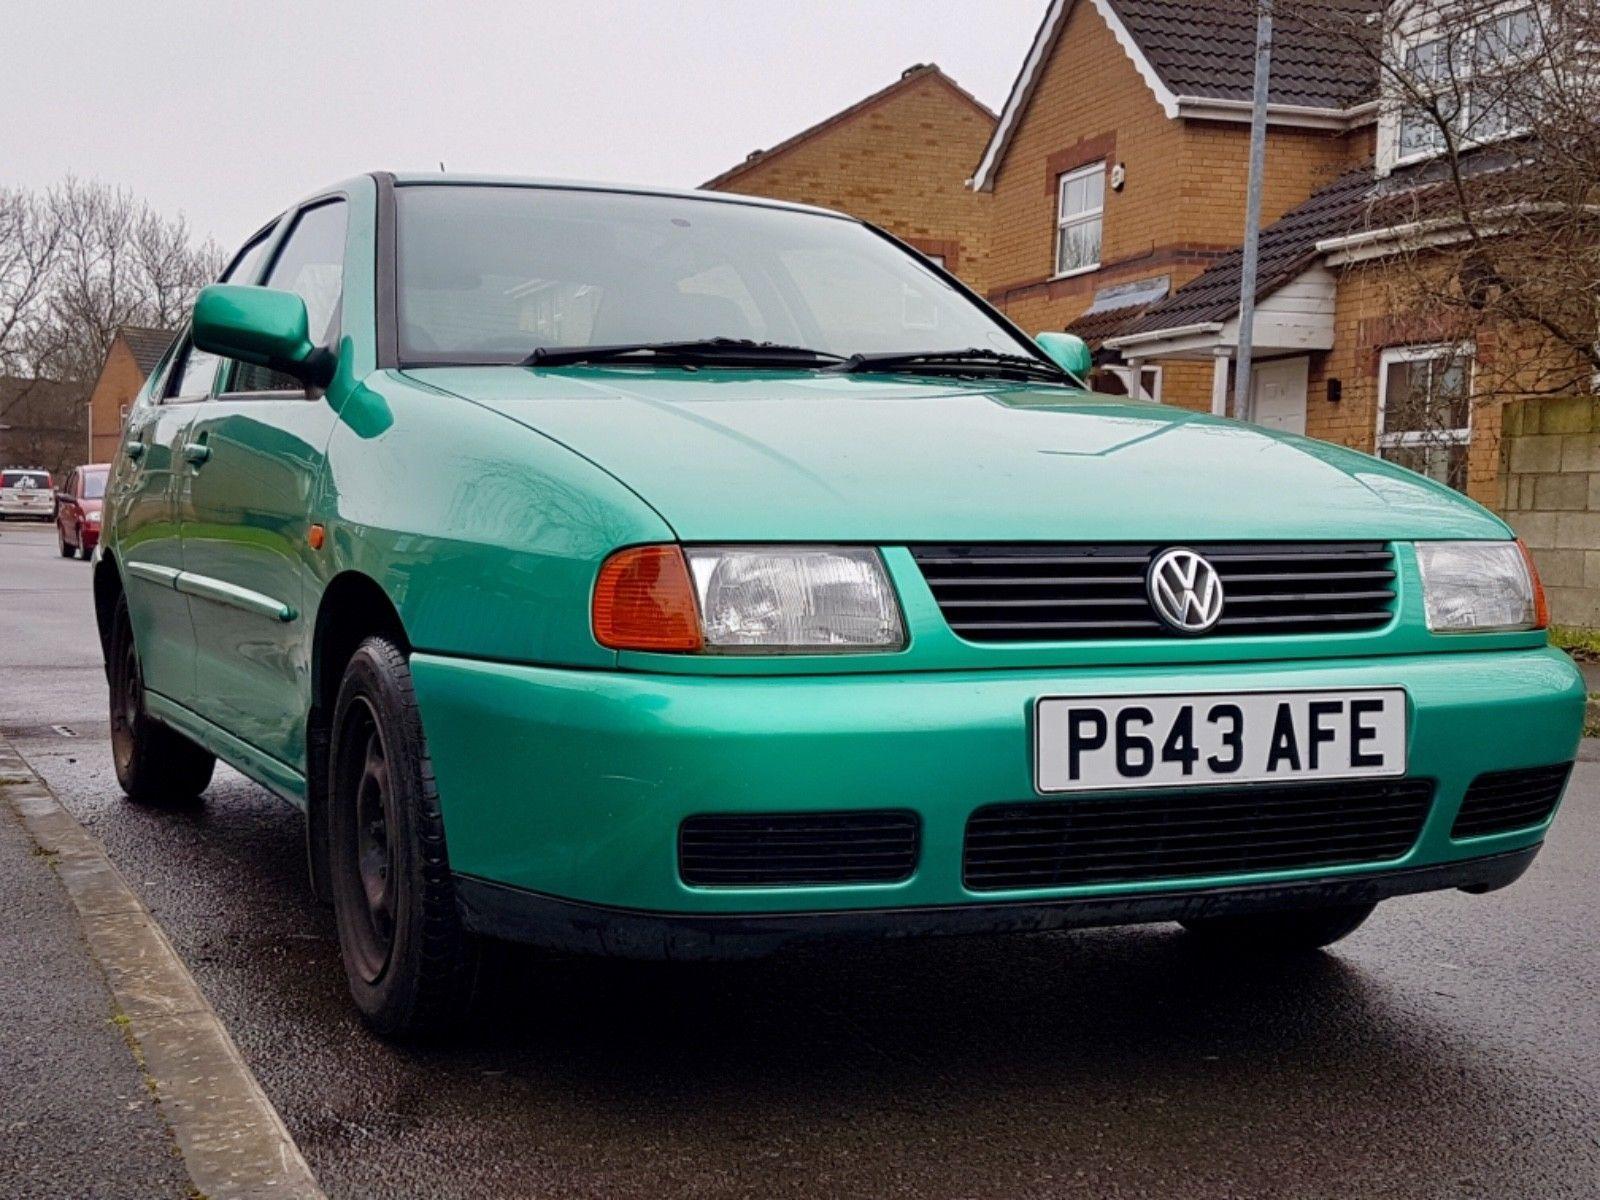 eBay: VOLKSWAGEN POLO MK3 1.6 CL SALOON VW LIKE JETTA GREEN 1997 MANUAL  SPARES REPAIR #carparts #carrepair